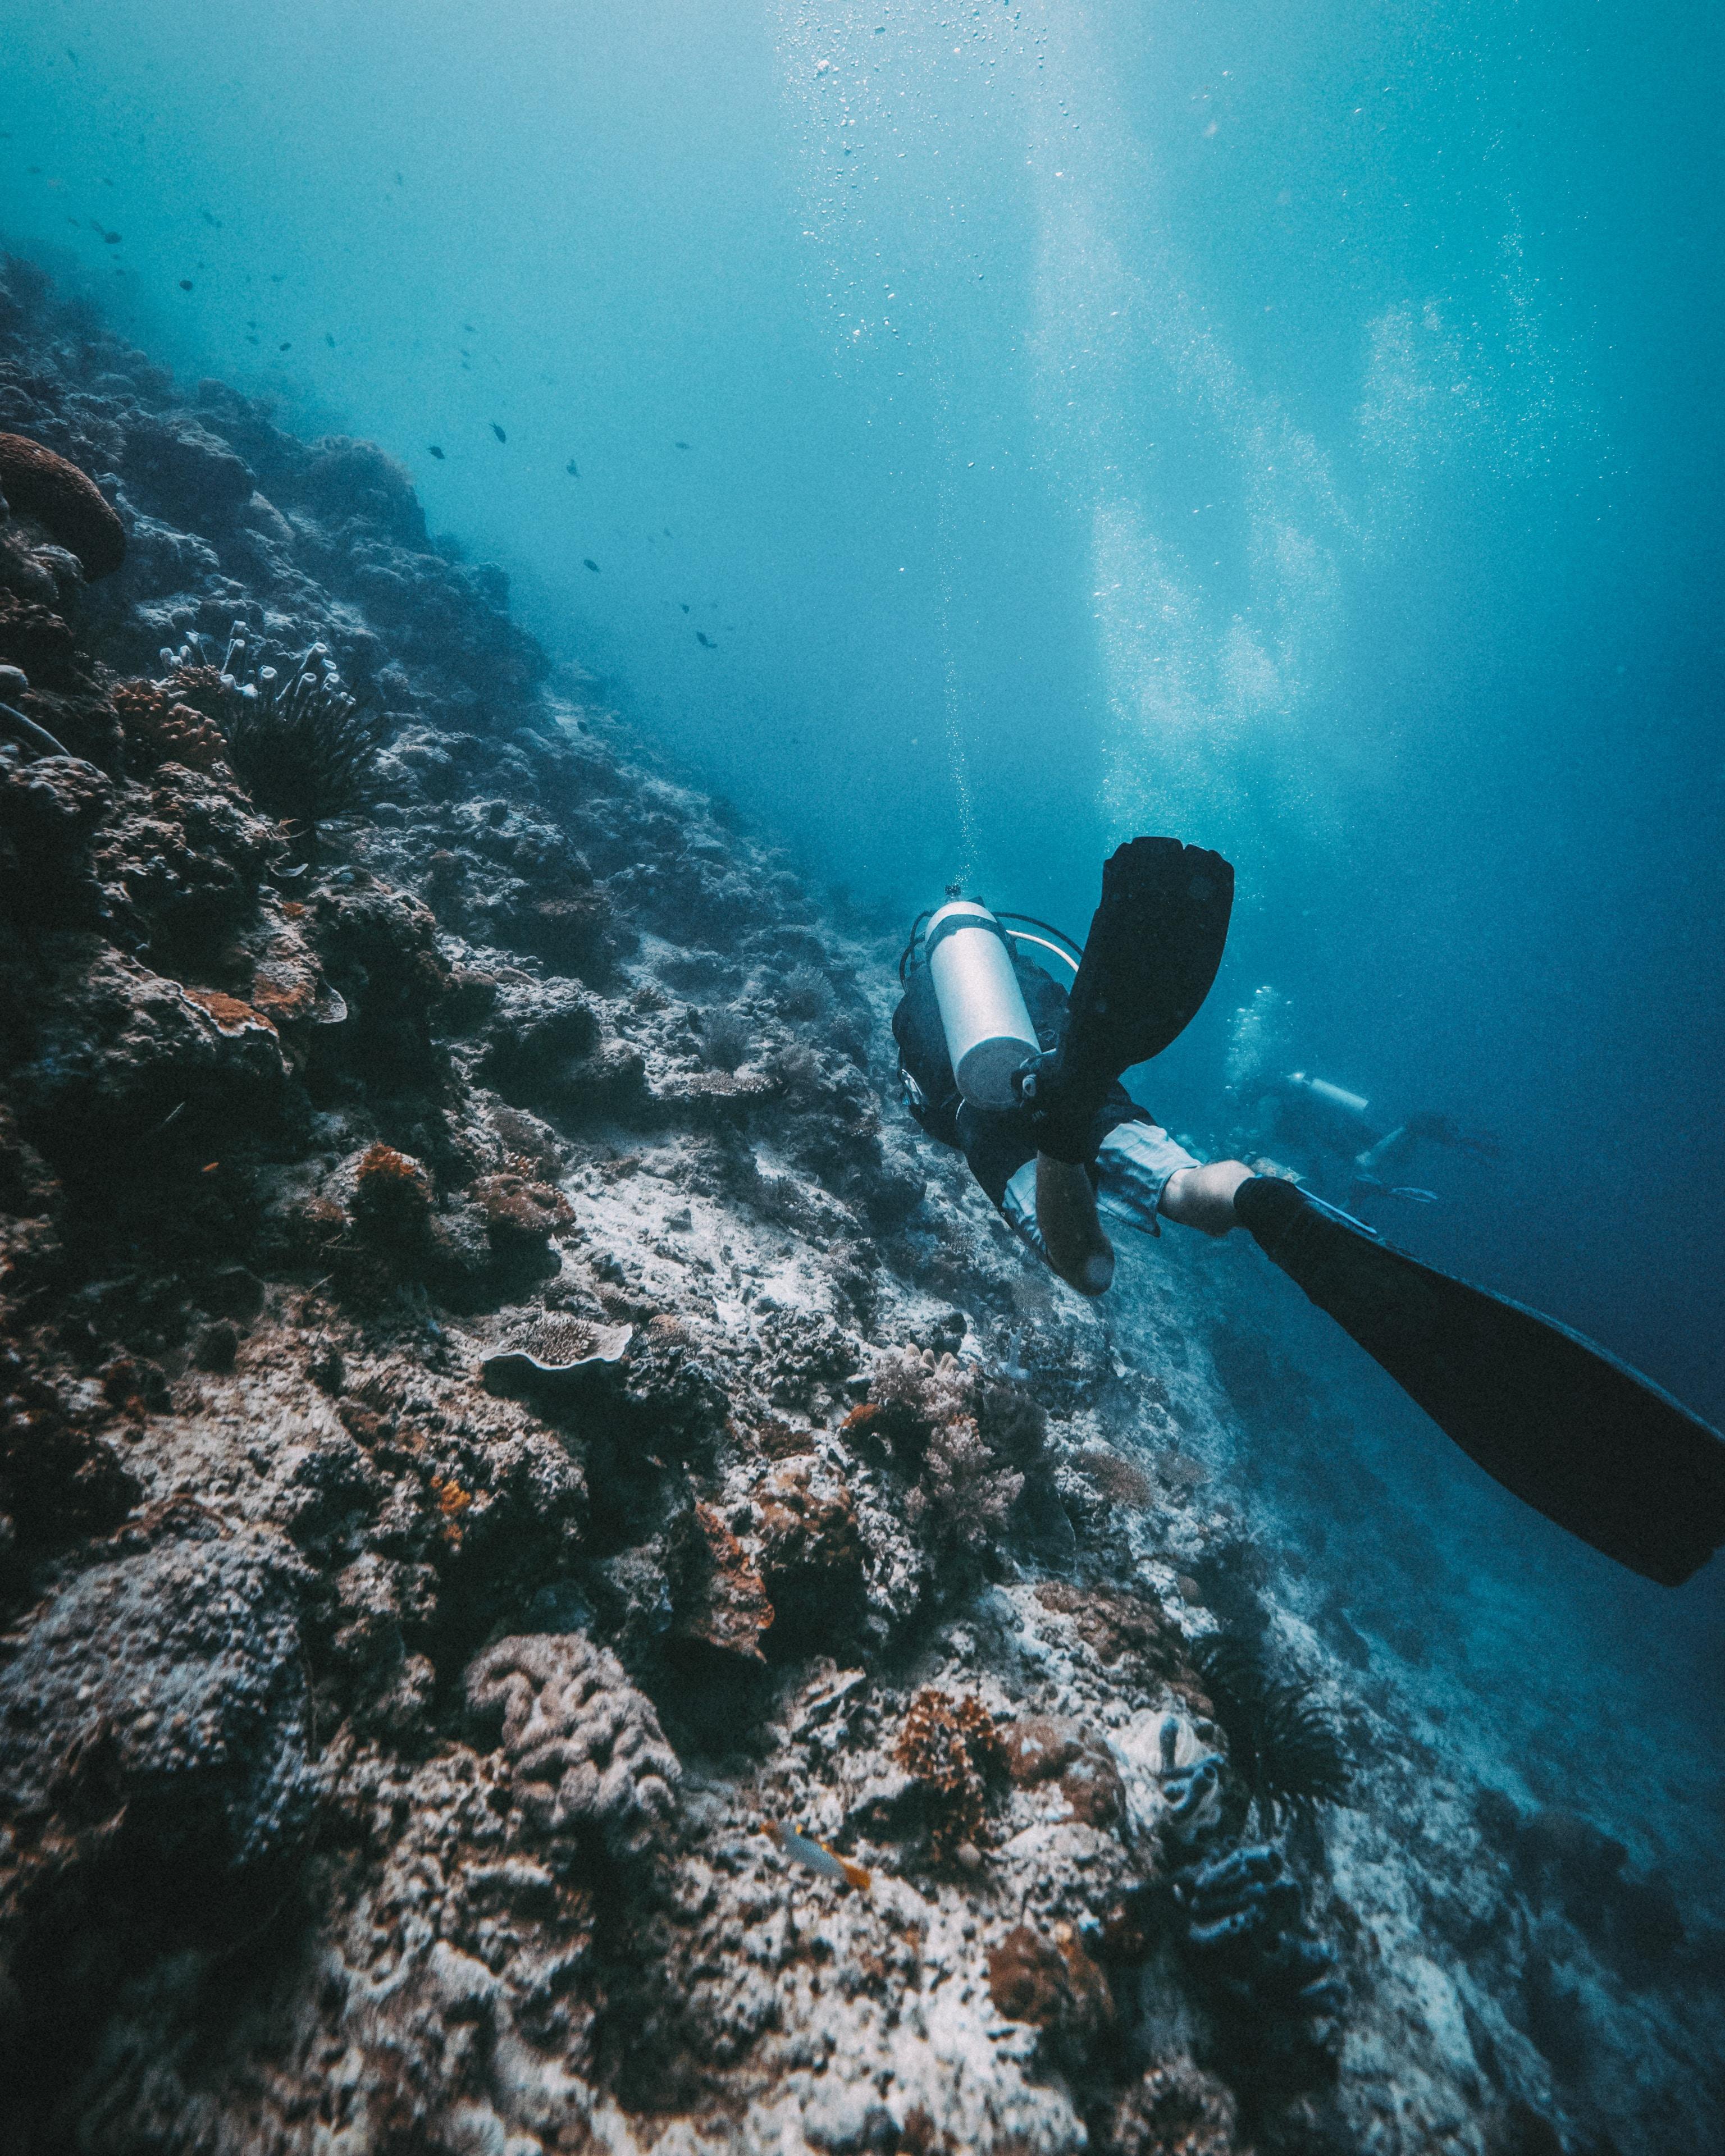 person performing scuba diving